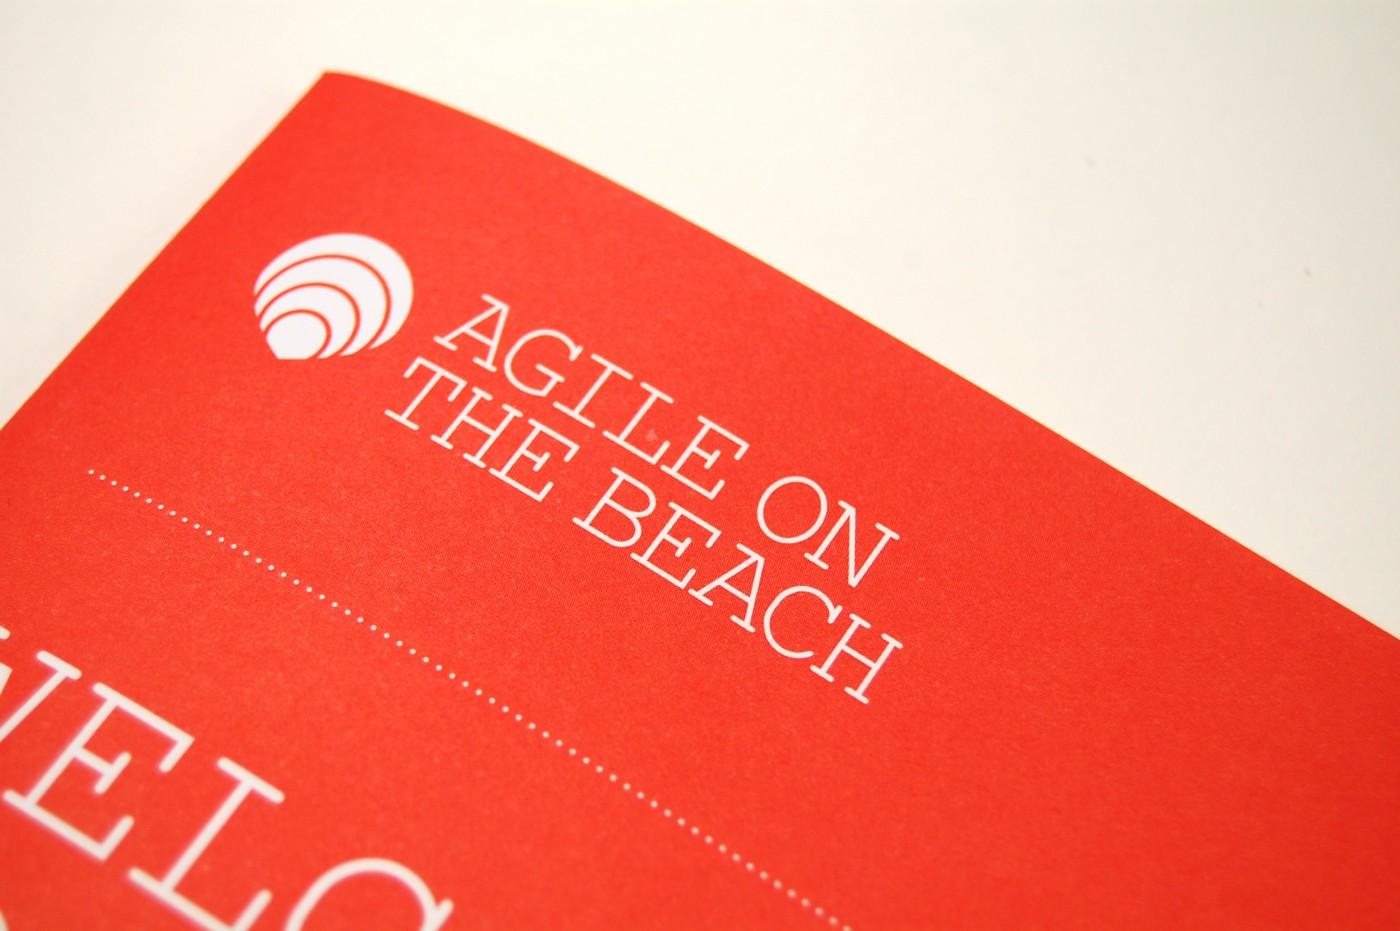 agile on the beach brand identity logo design